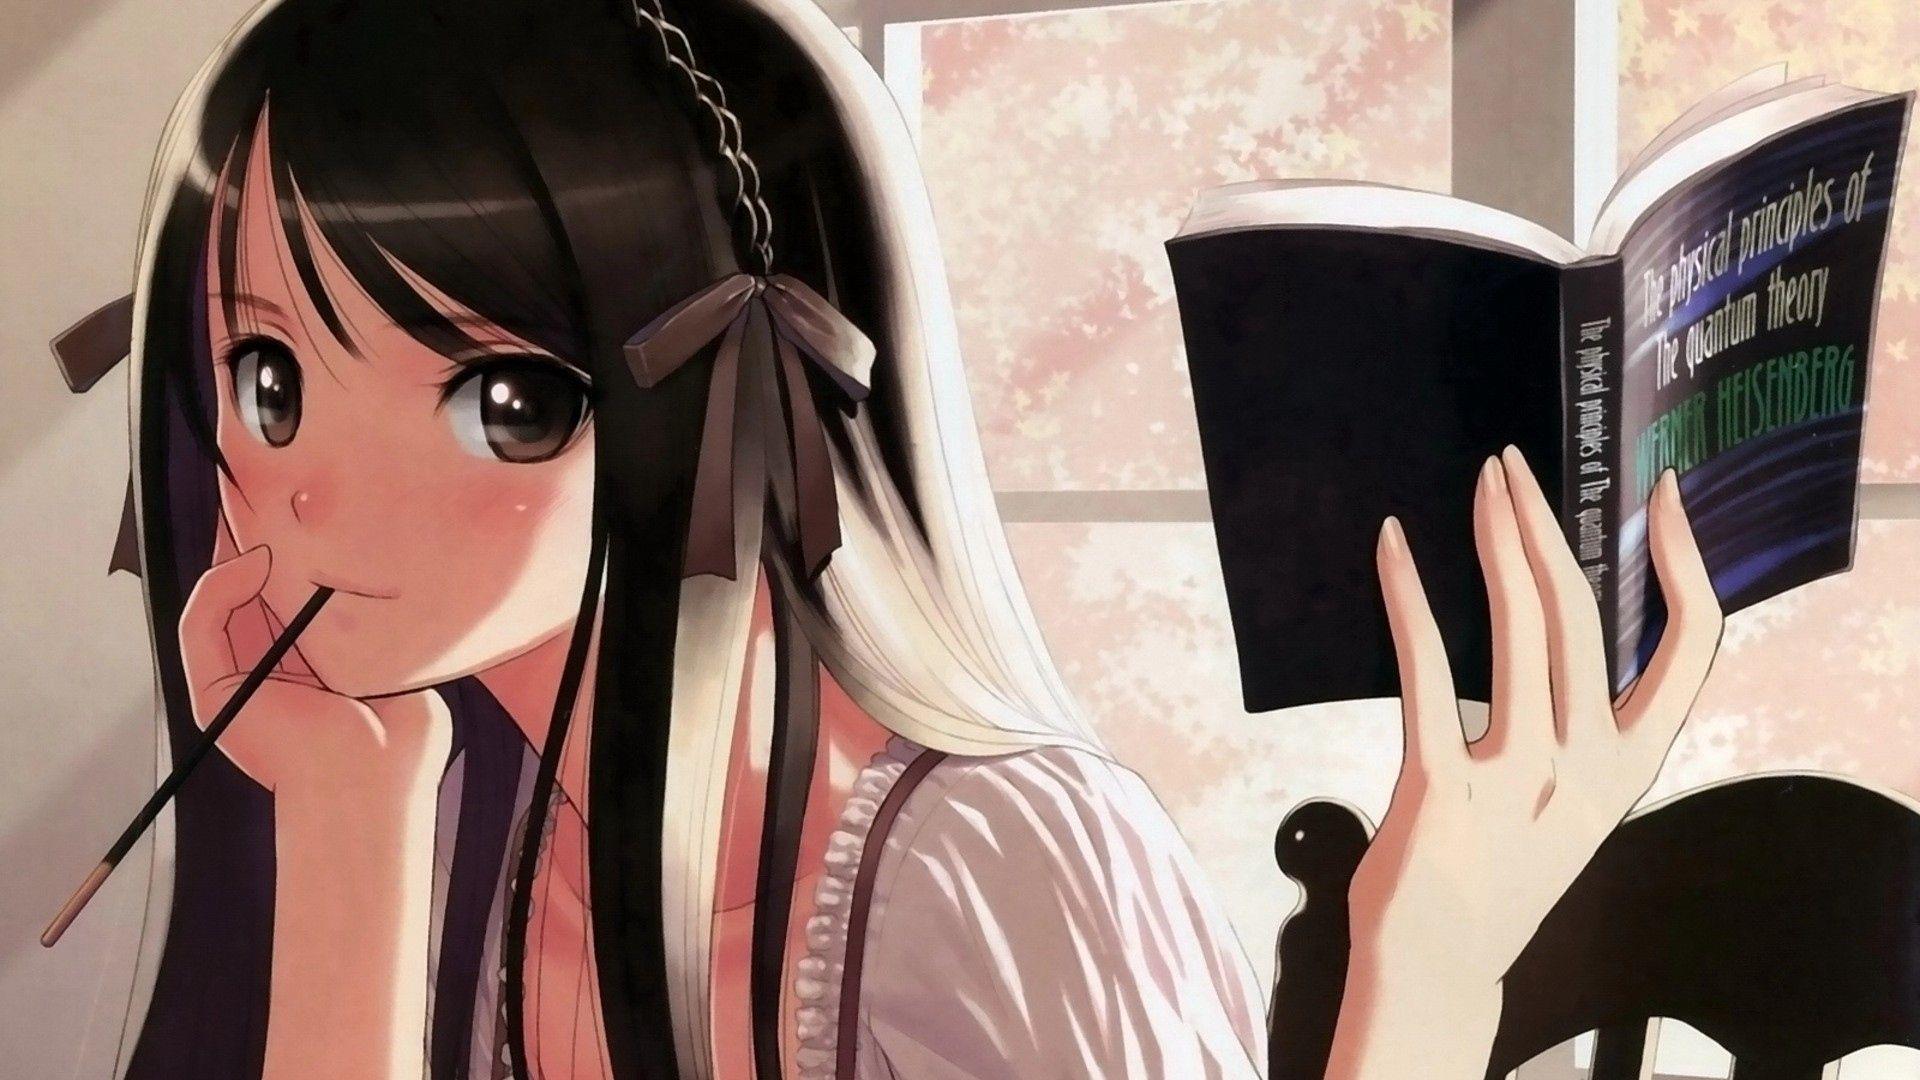 Download Wallpaper Anime Cute Manga Con Imagenes Fondo De